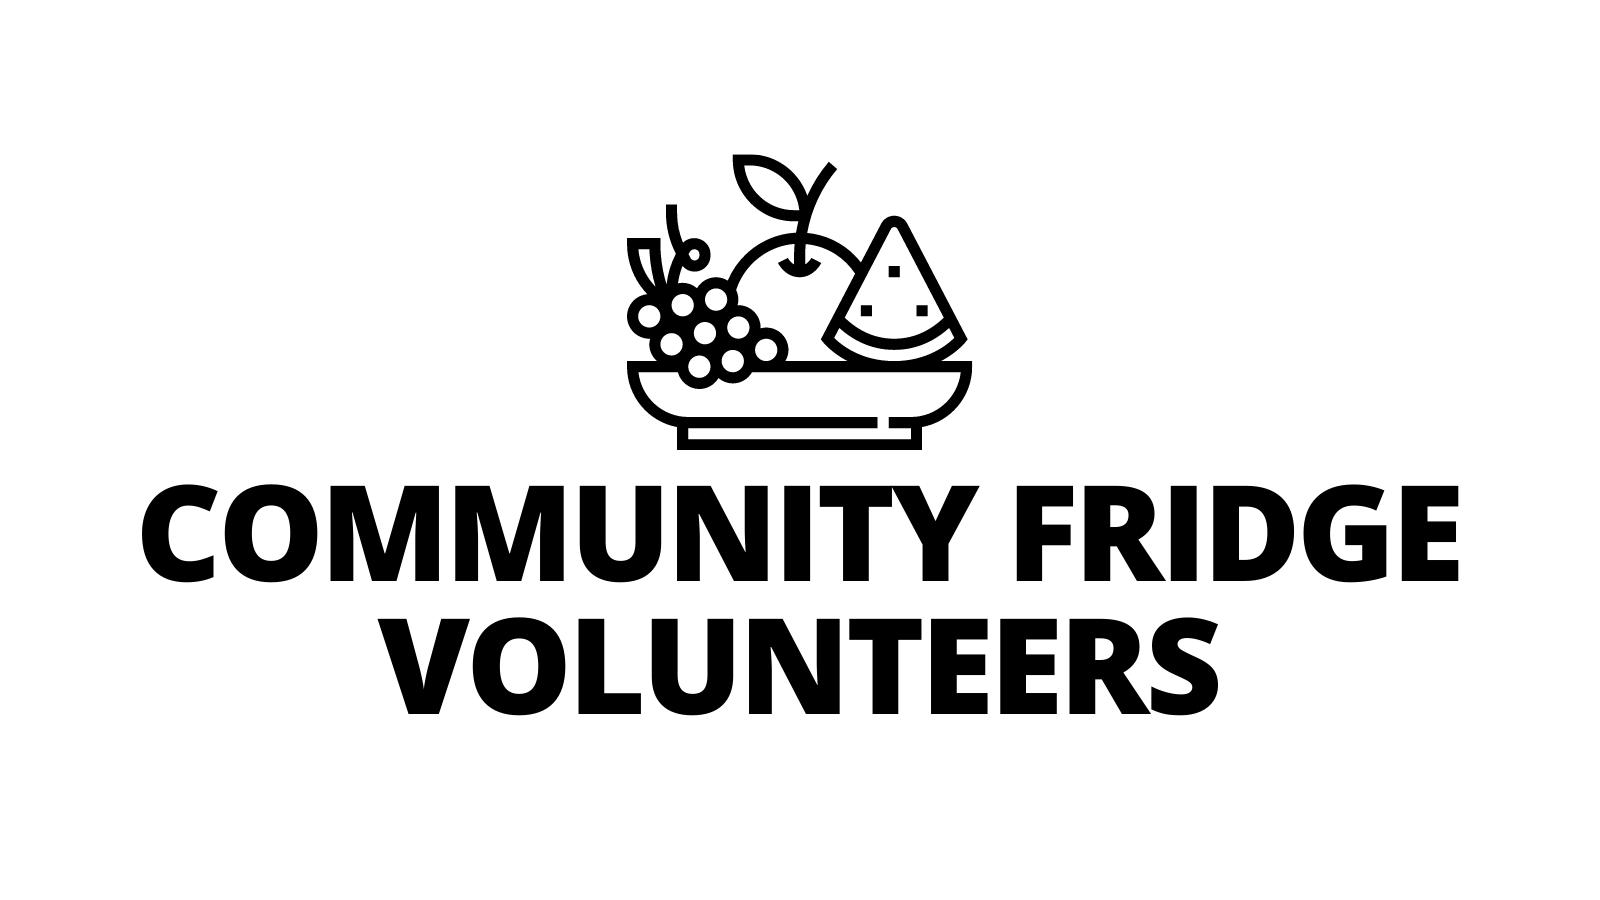 Community Fridge Volunteers